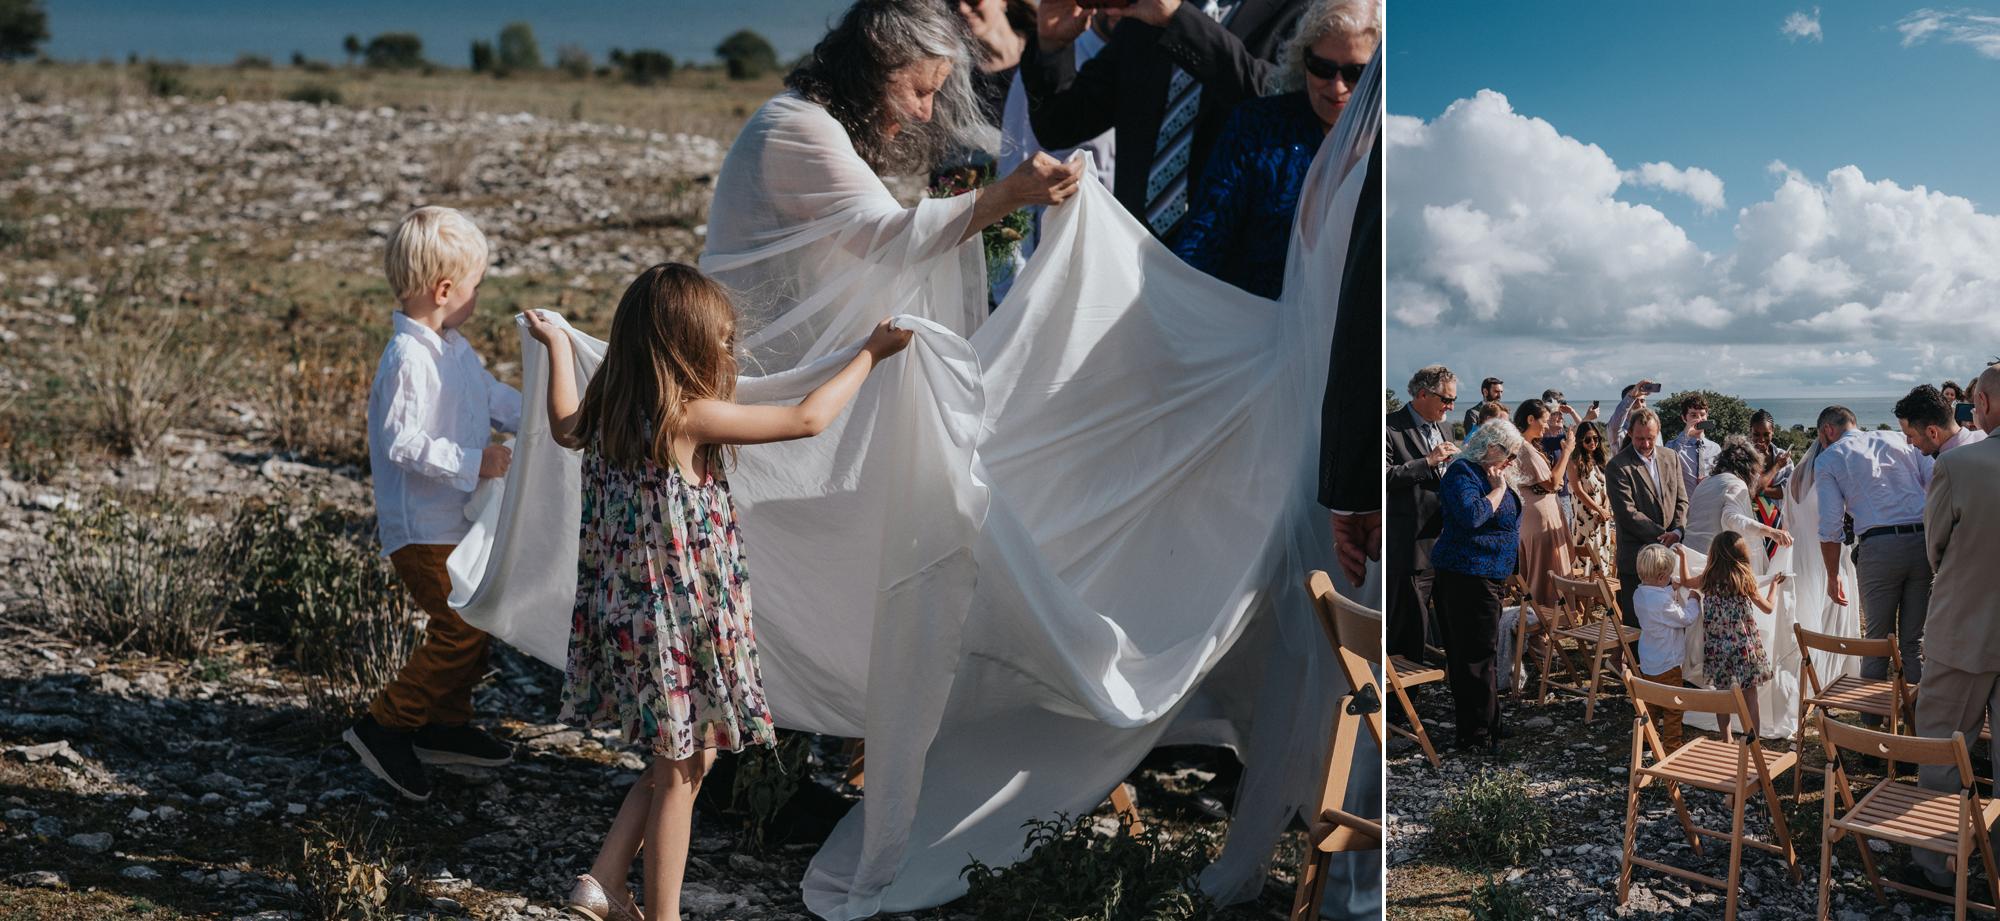 016-bröllop-stora-gåsemora-neas-fotografi.jpg